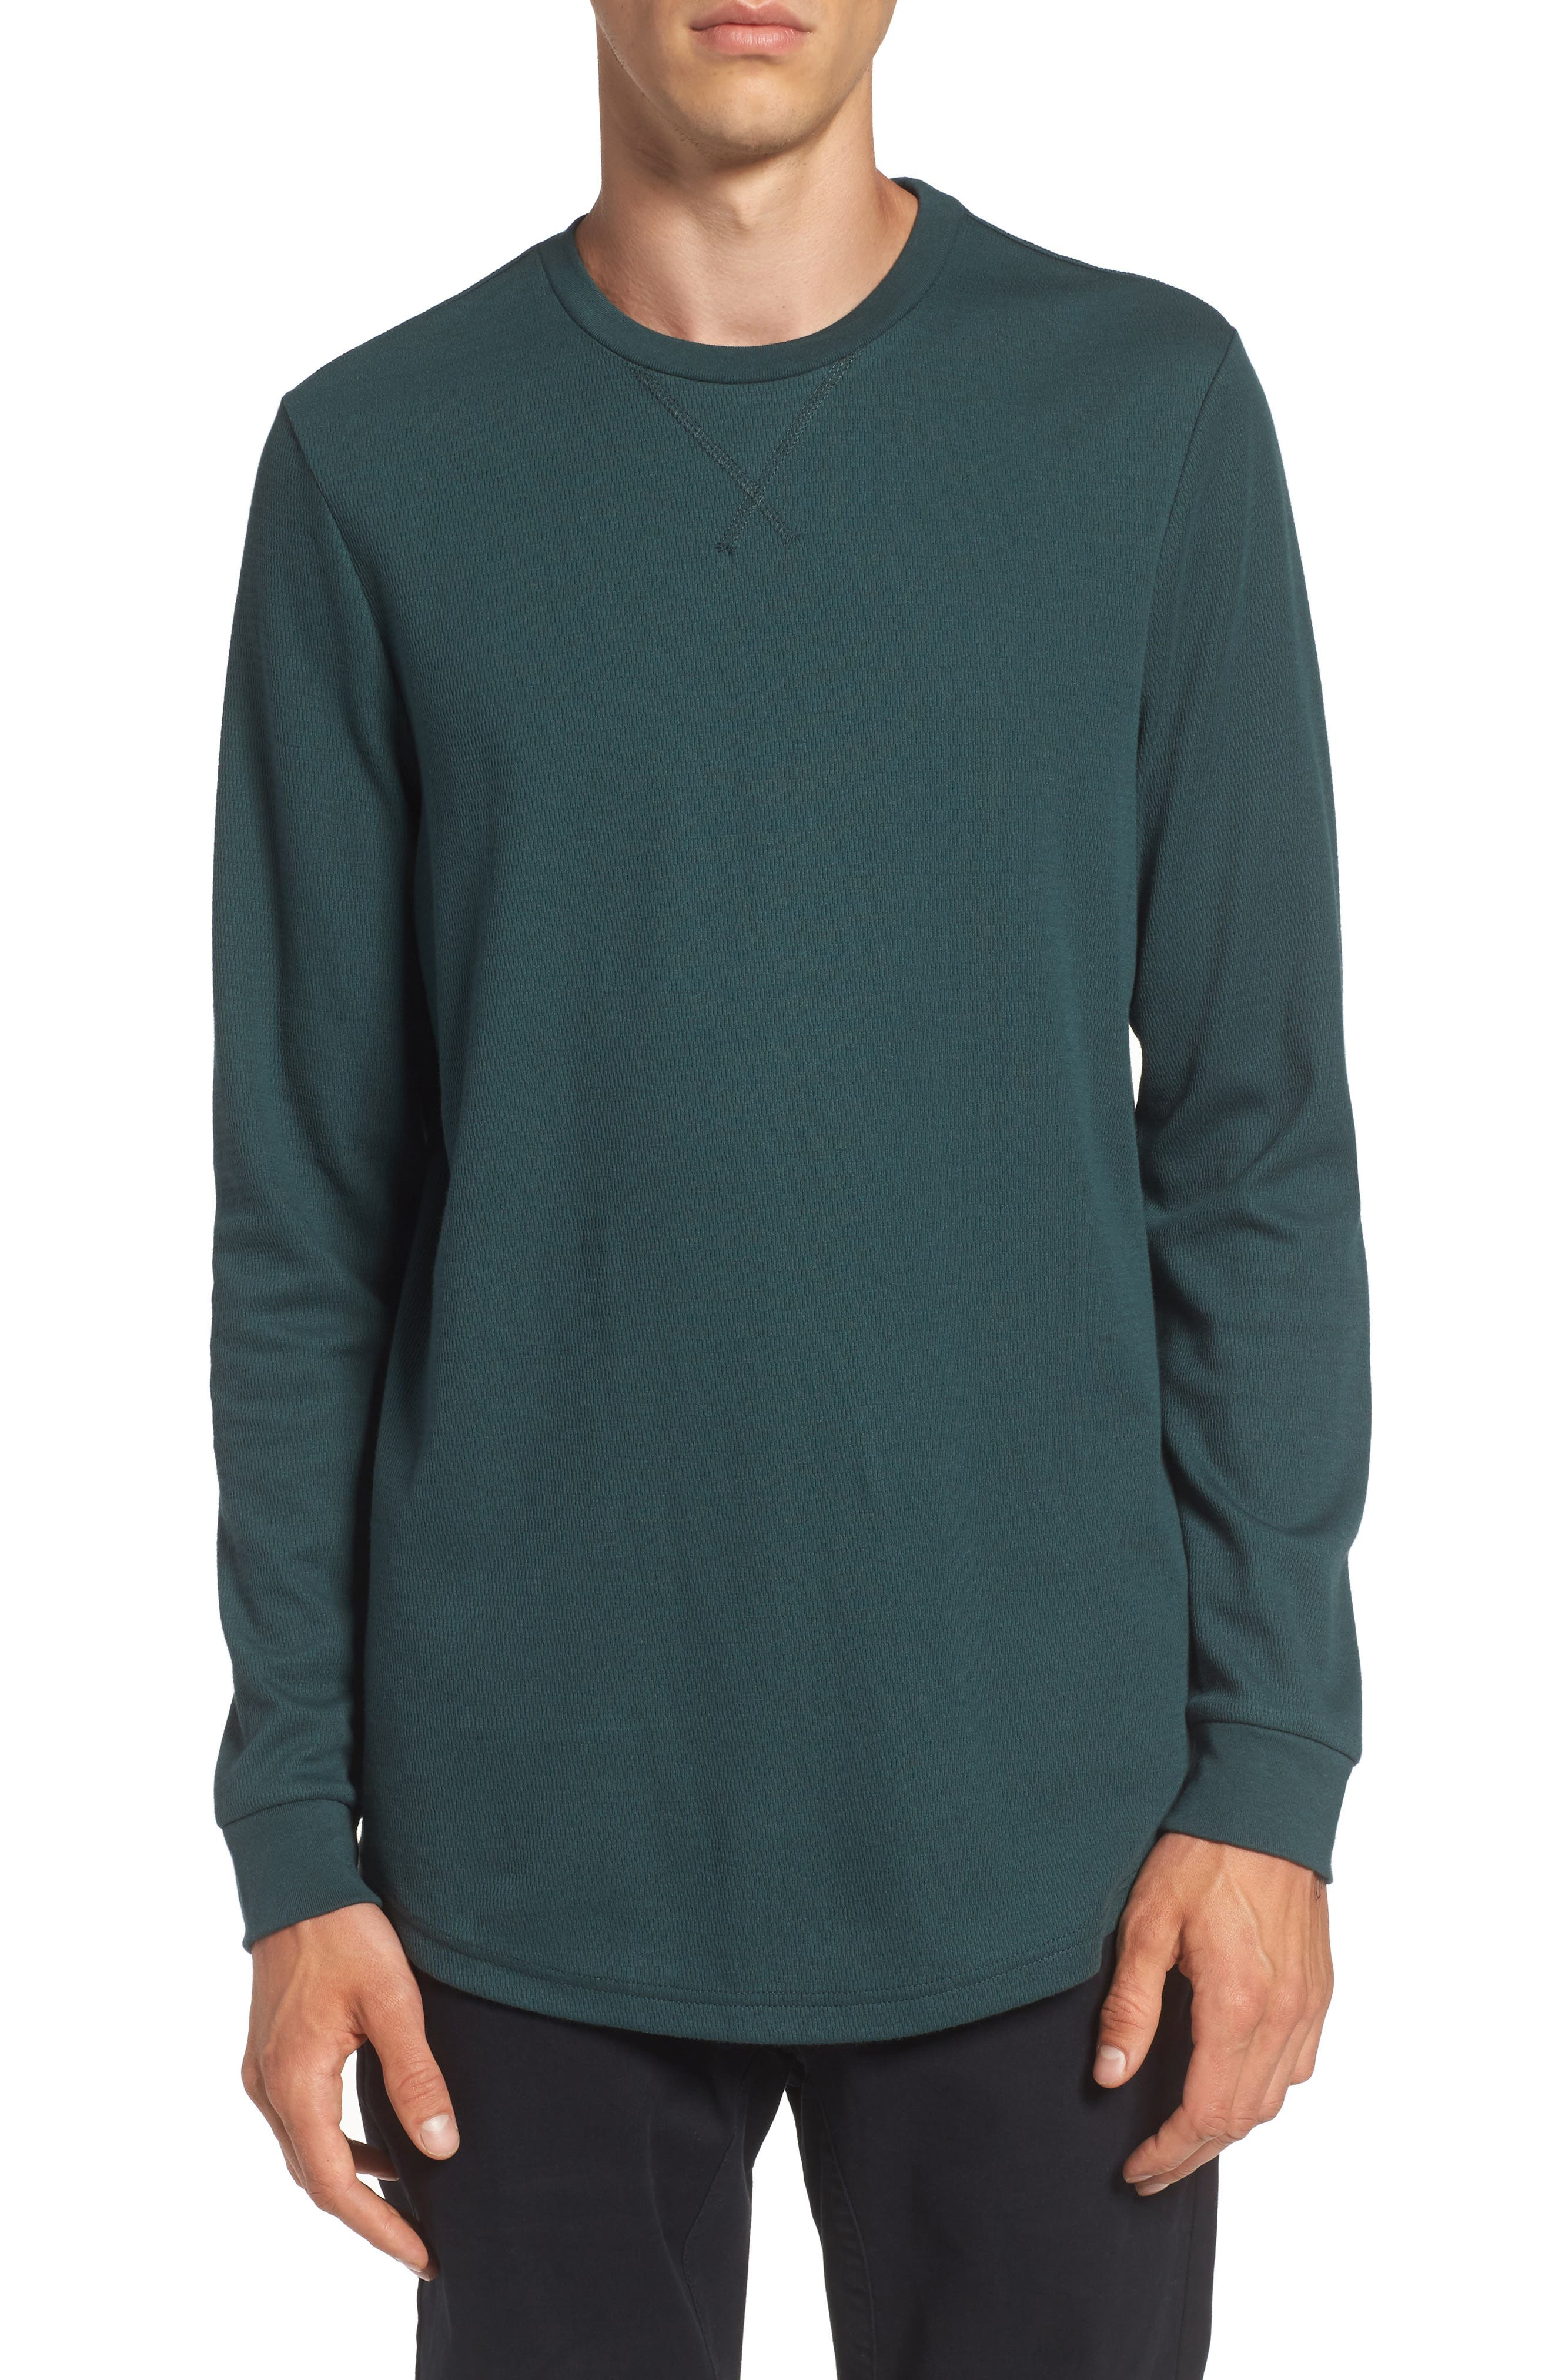 Alternate Image 1 Selected - The Rail Longline Thermal T-Shirt